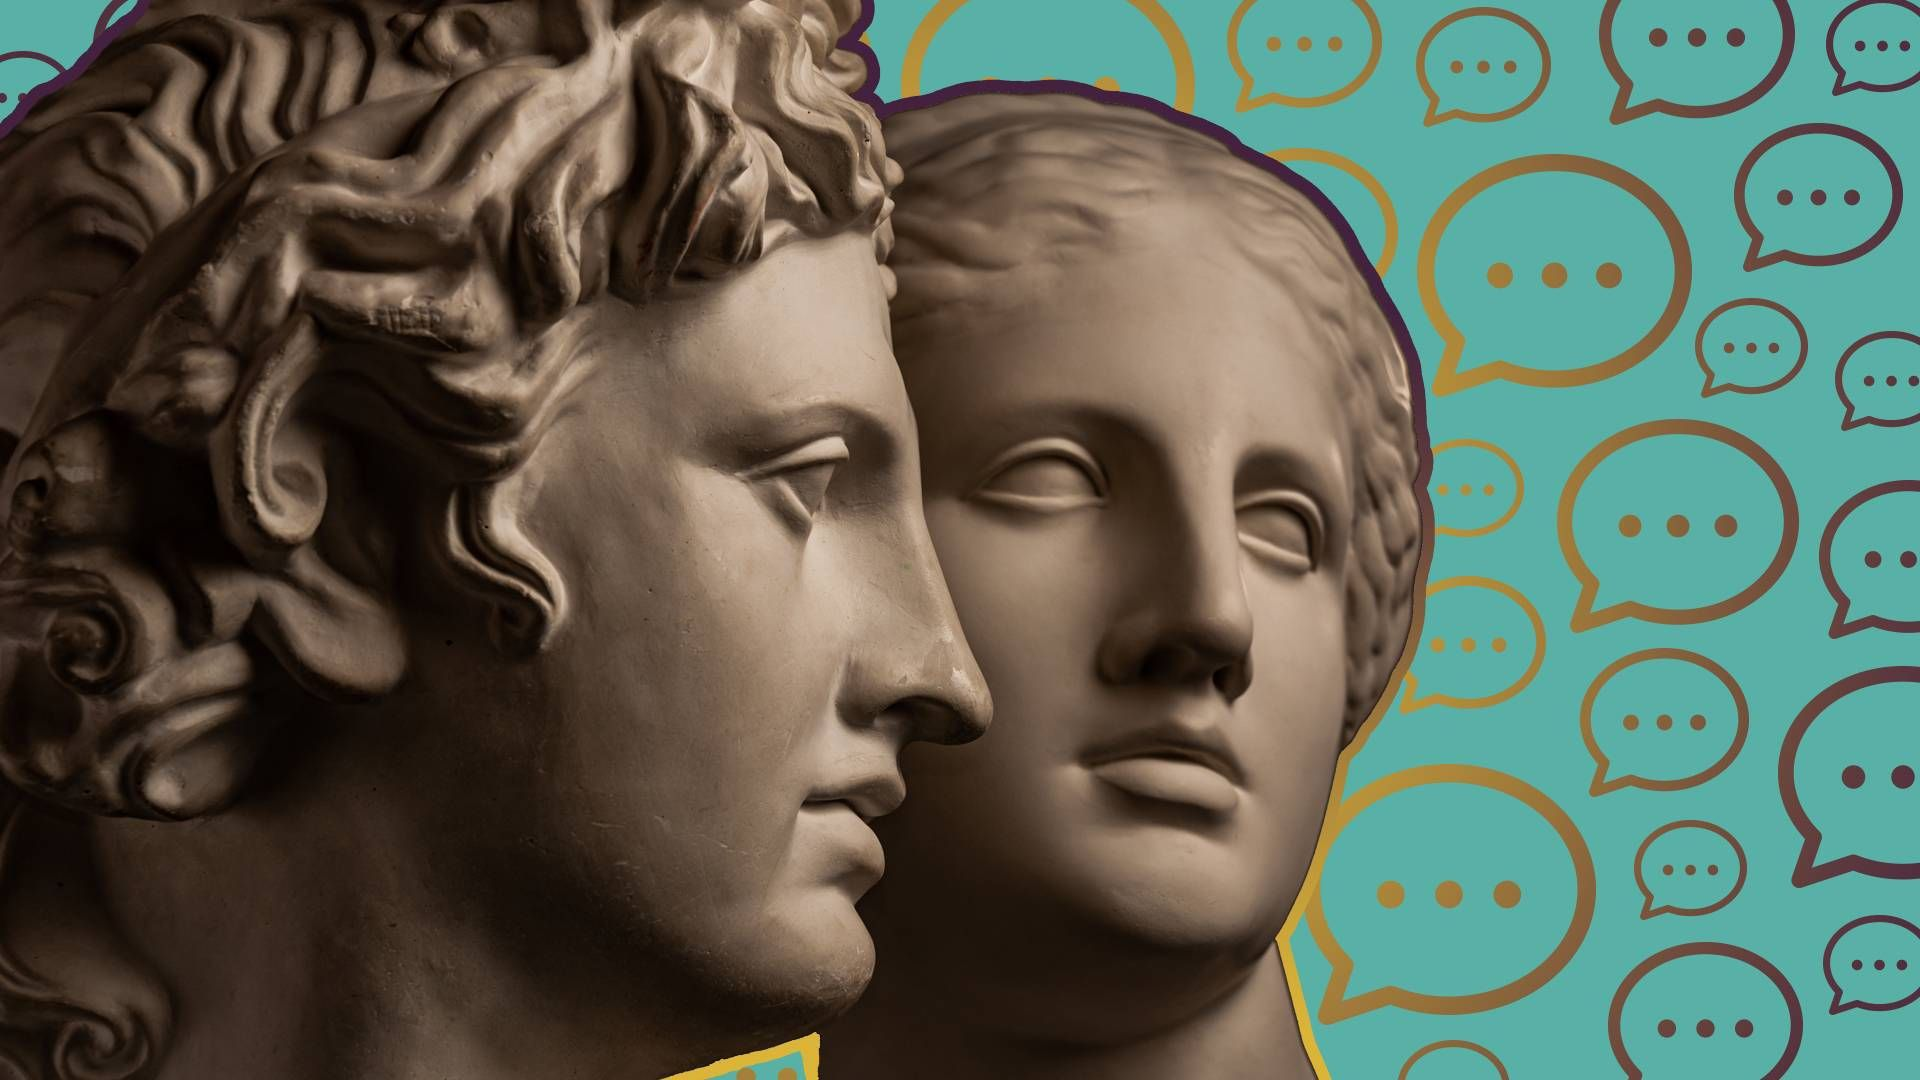 two statues. rewire, pbs, friends, friendships